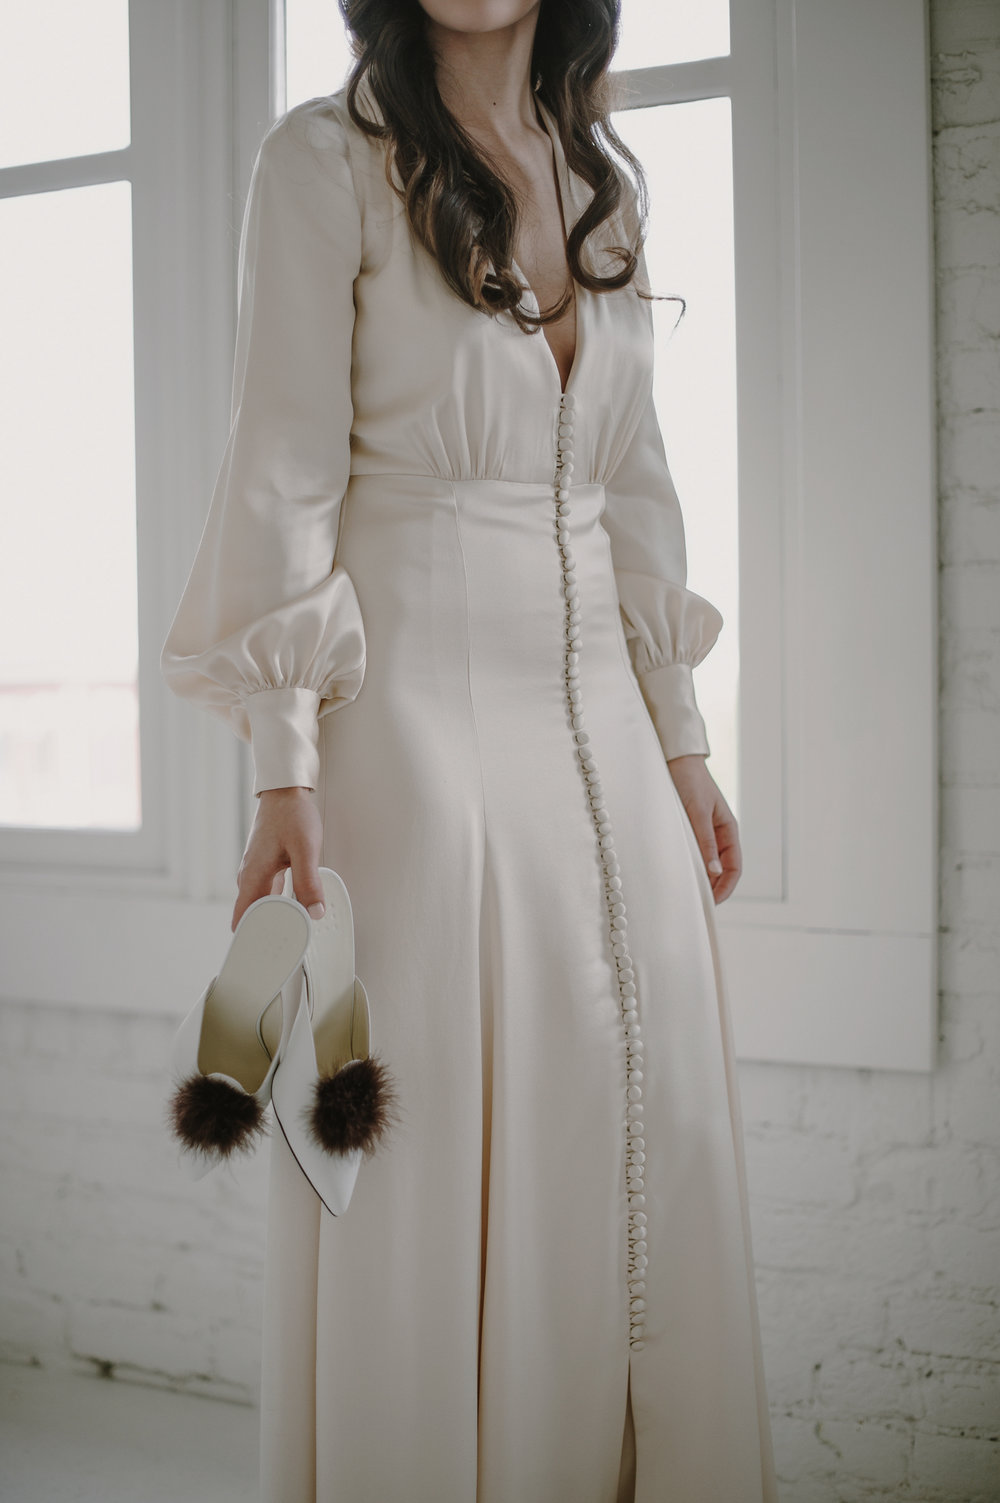 kristenmarieparker_tacoma_conservatory_warehouse_wedding017.JPG